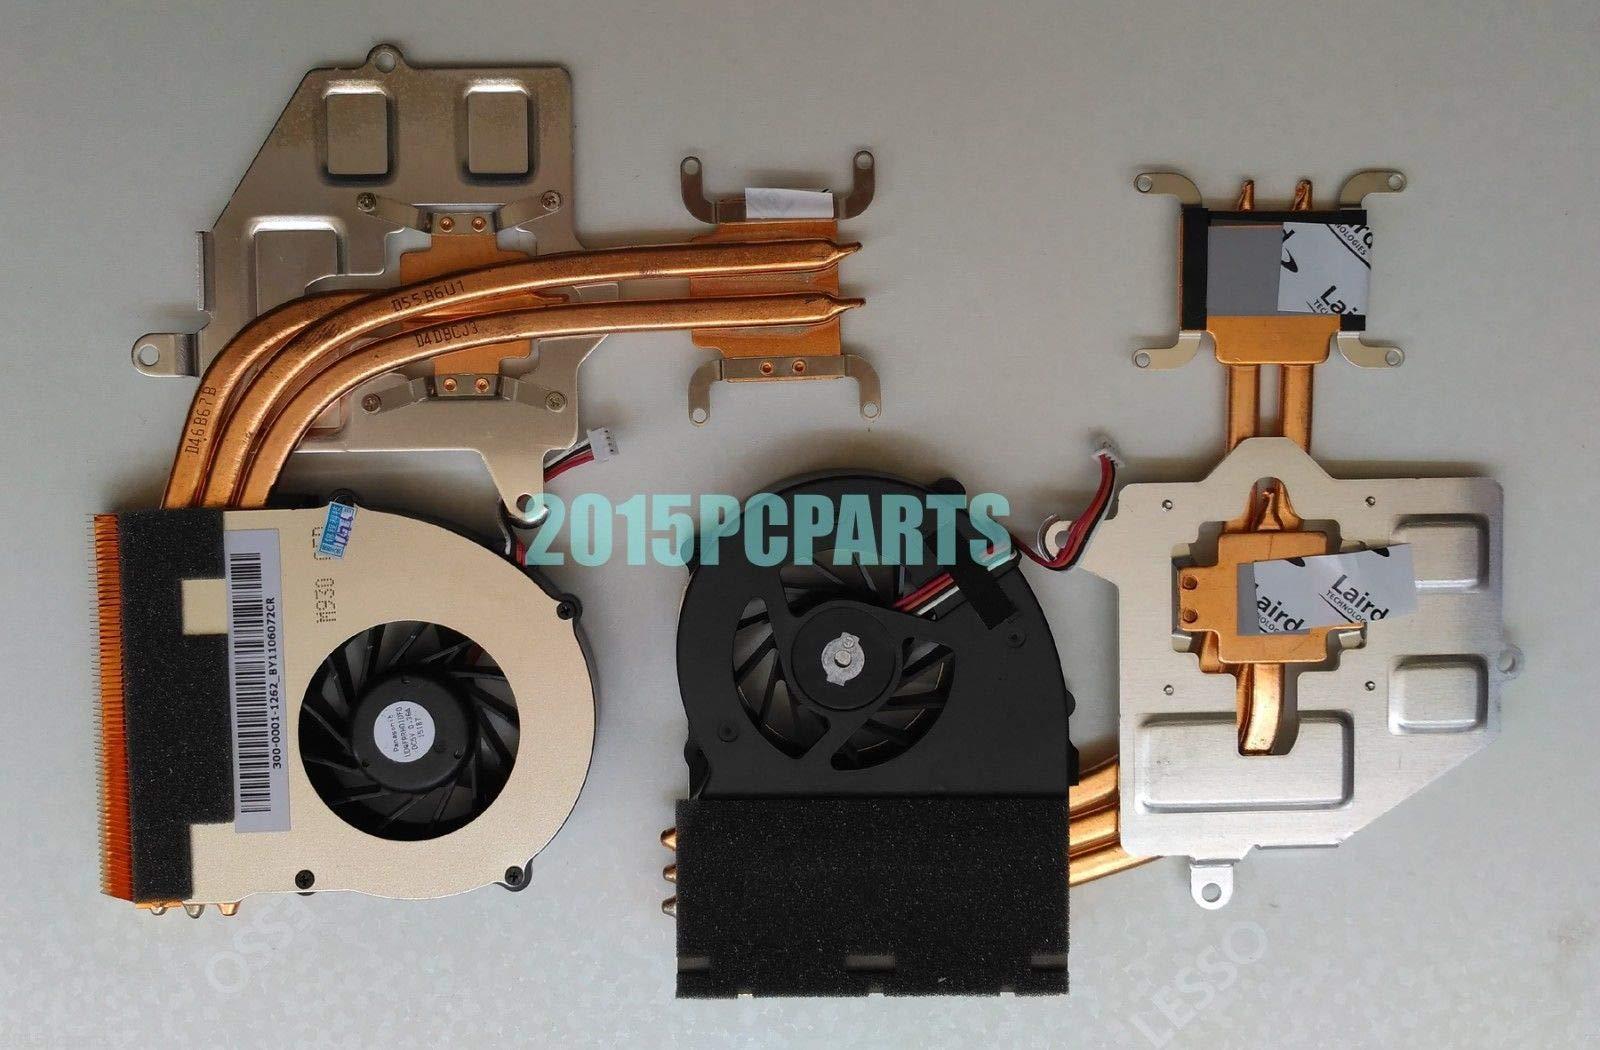 FidgetGear CPU Cooling Fan for Sony VPC-F M930 PCG-81214L PCG-81114L CPU Fan with Heatsink UDQFRRH01DF0 by FidgetGear